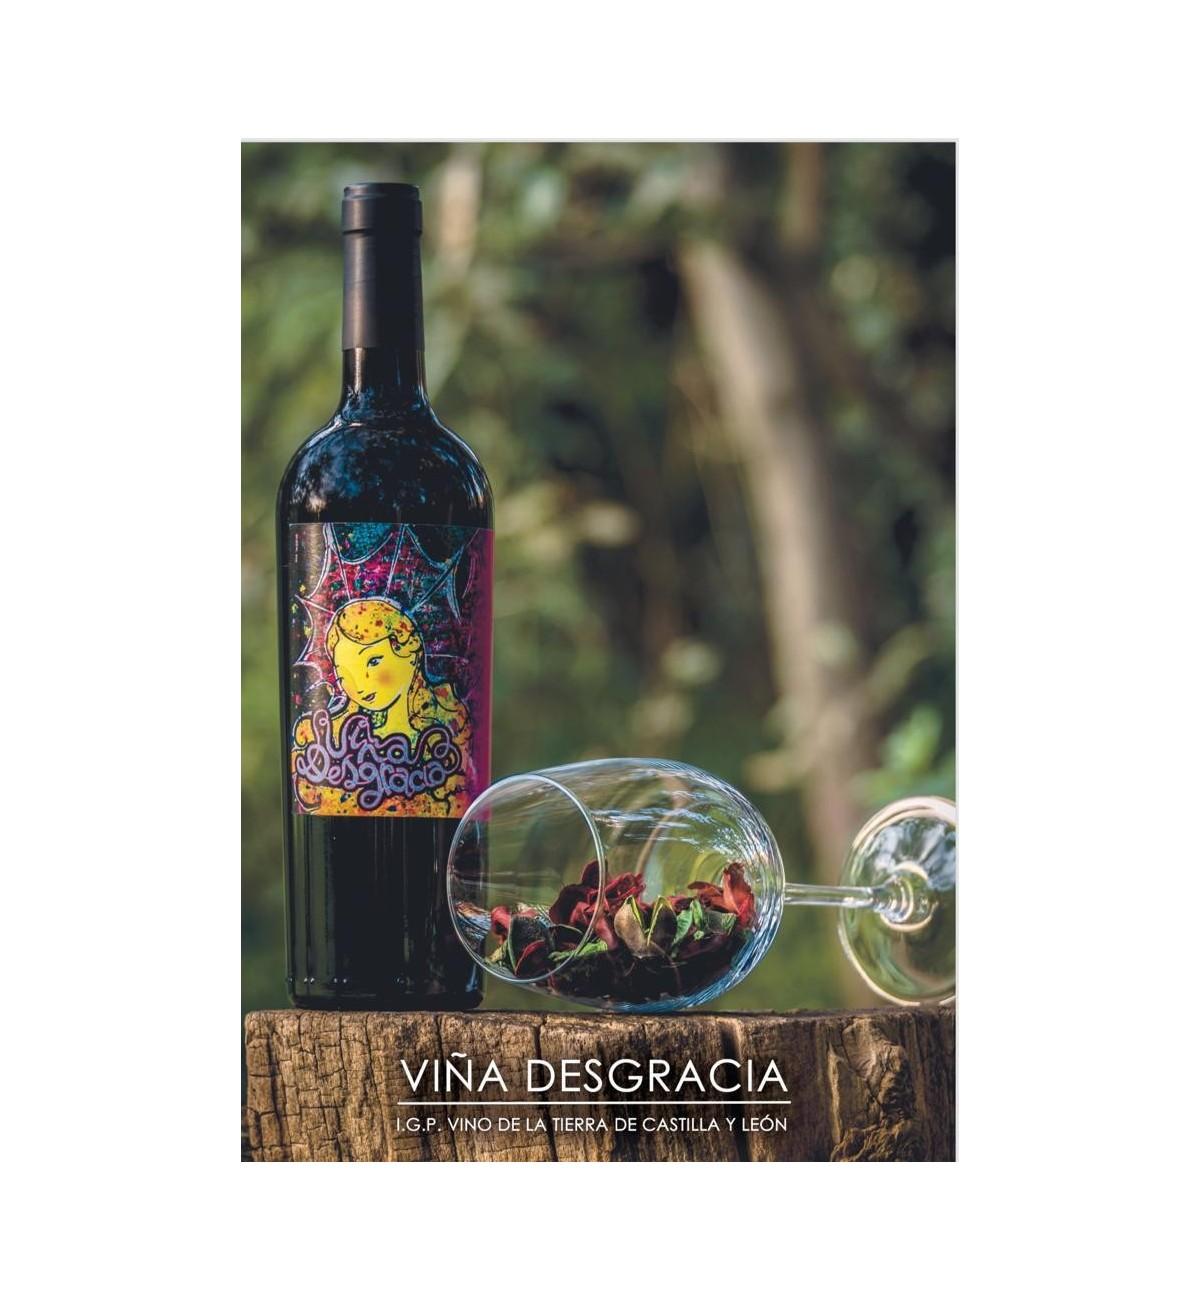 Viña Desgracia 2017 Tempranillo - 6 botellas  (Servicio directo desde la bodega, portes incluidos)